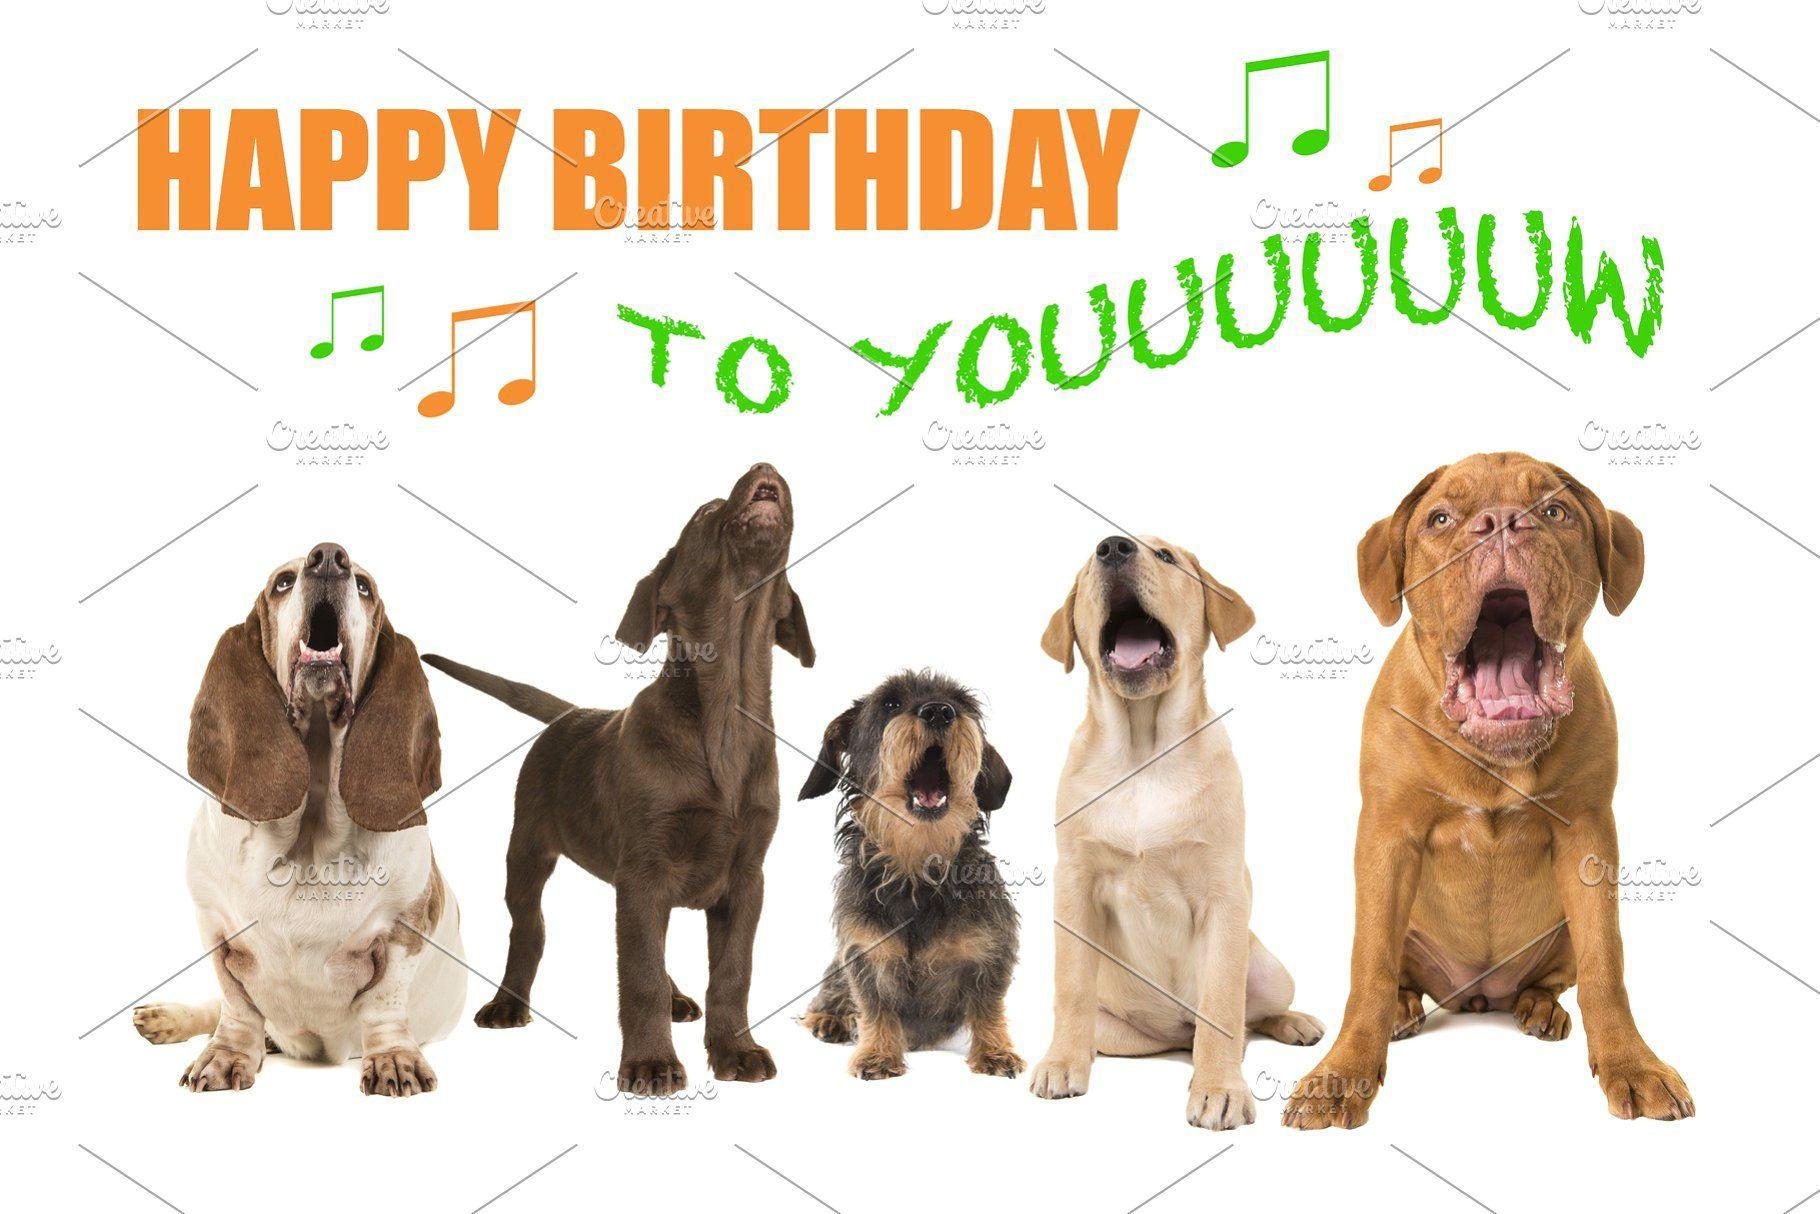 Dogs Singing Happy Birthday Containing Animal Pet And Dog Happy Birthday Dog Happy Birthday Animals Dog Birthday Wishes